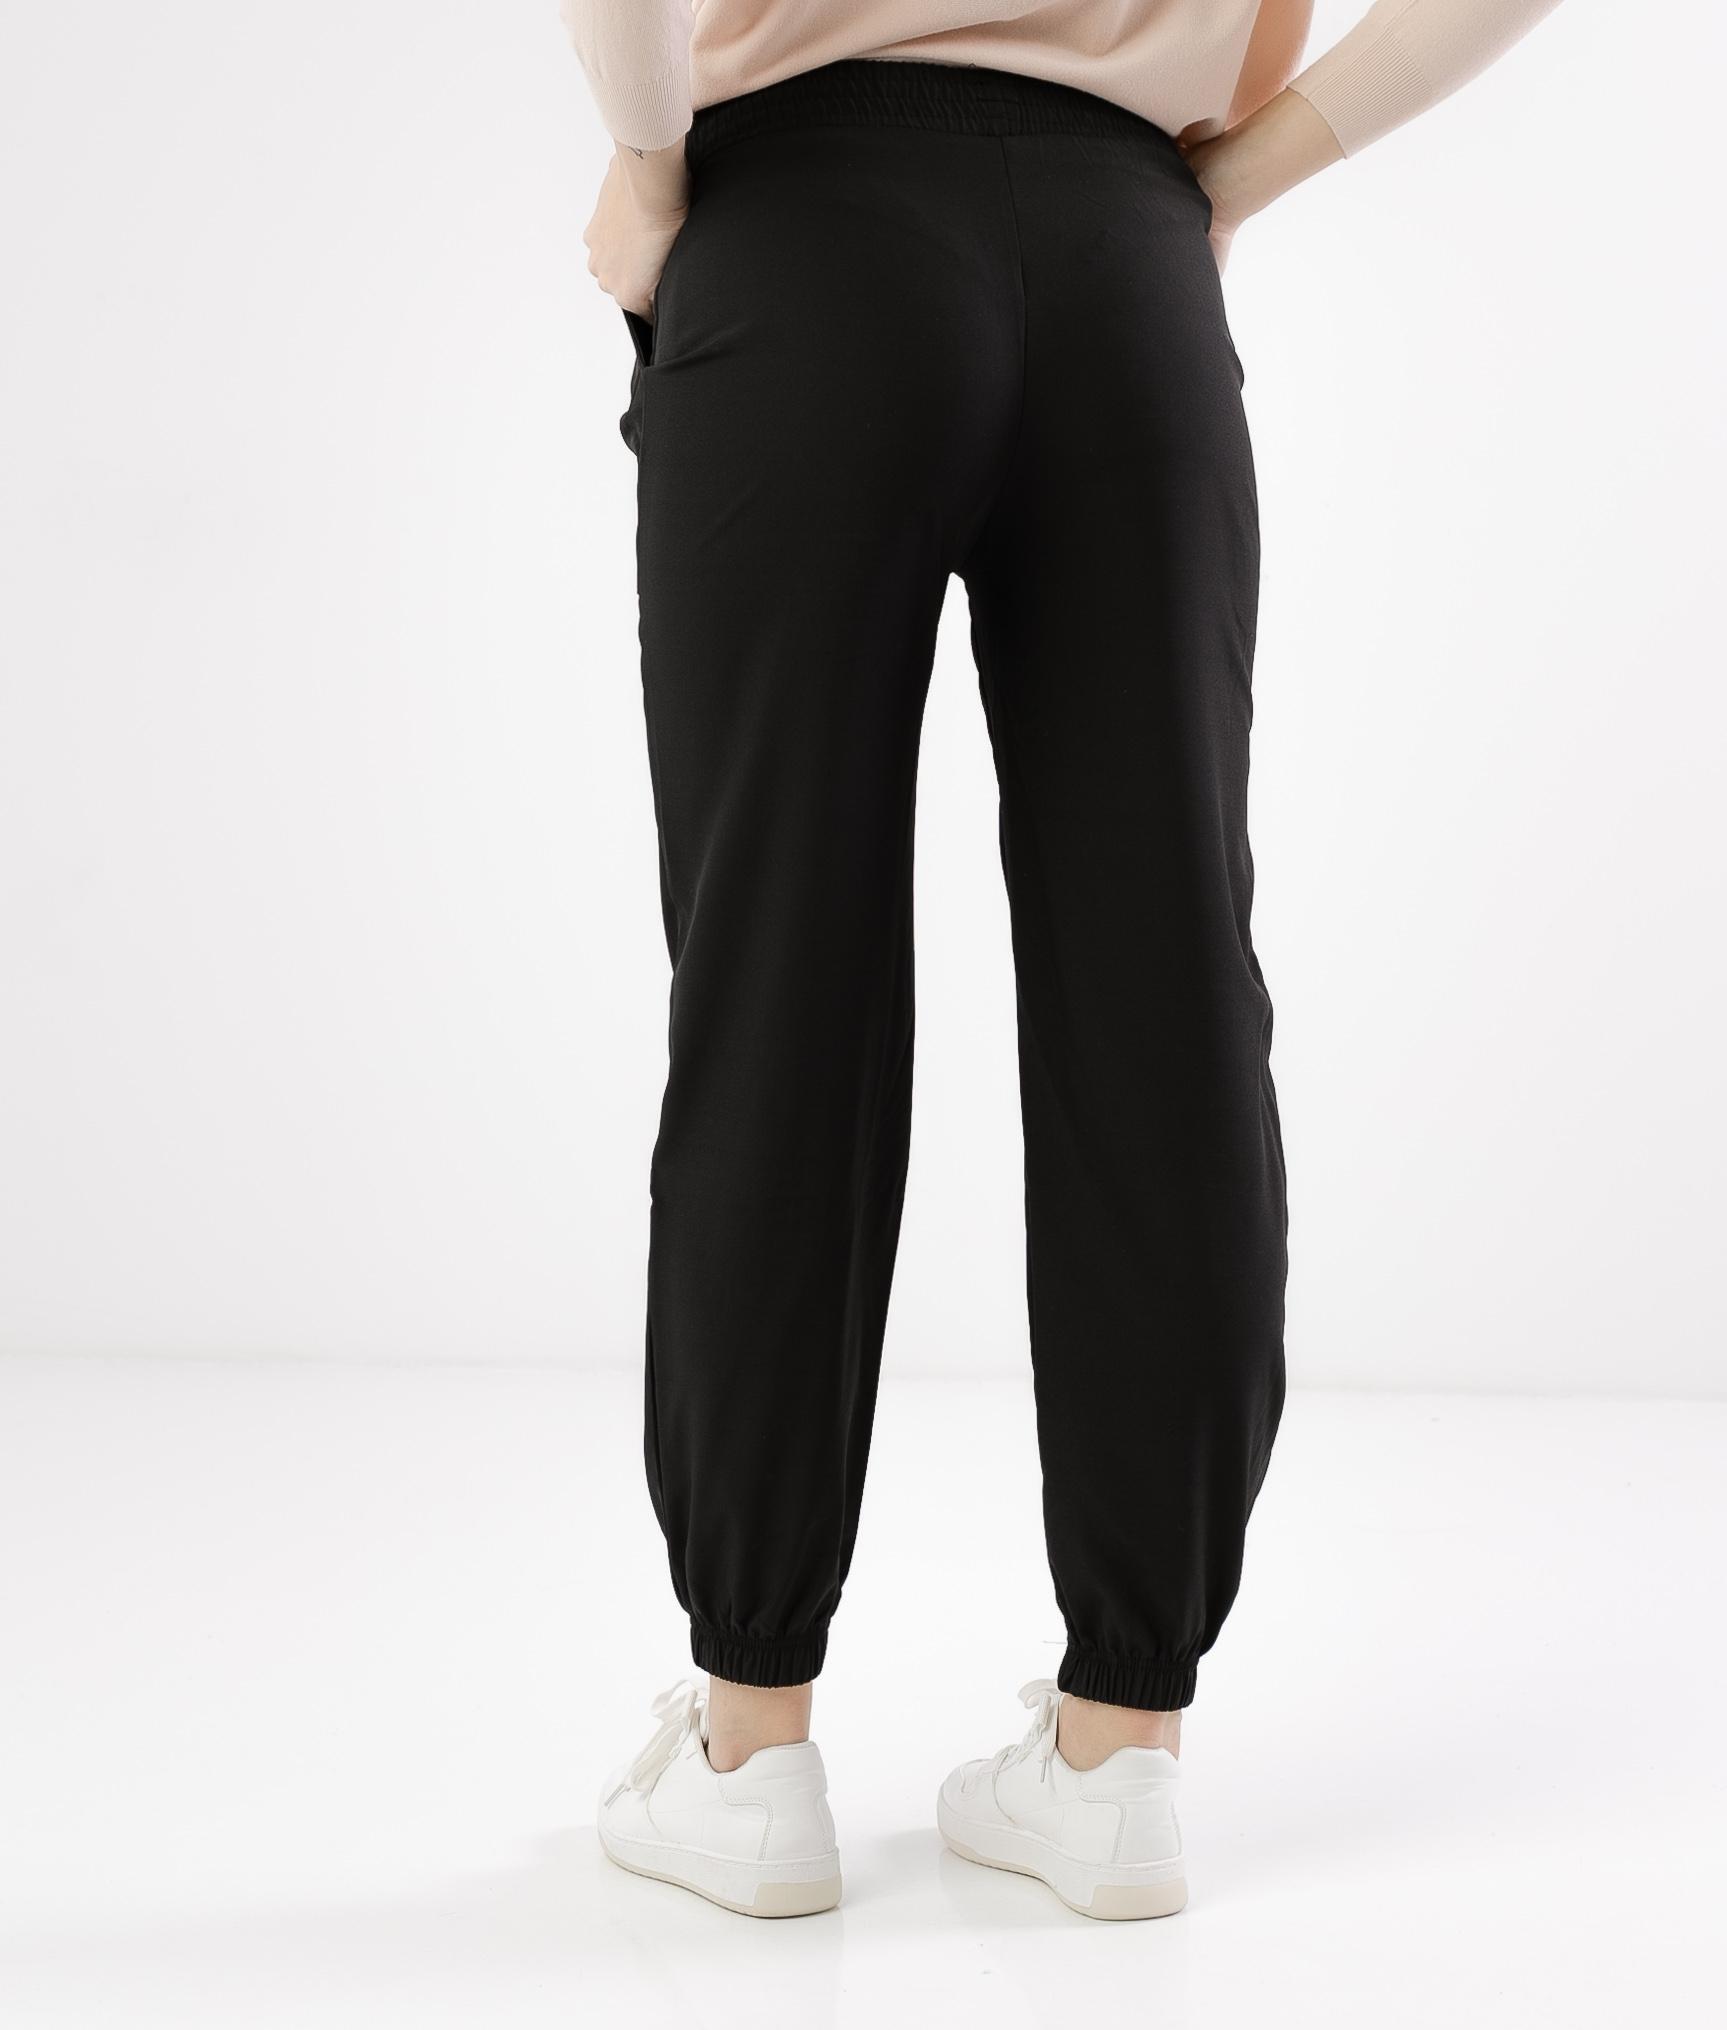 Pantalón Finber - Noir